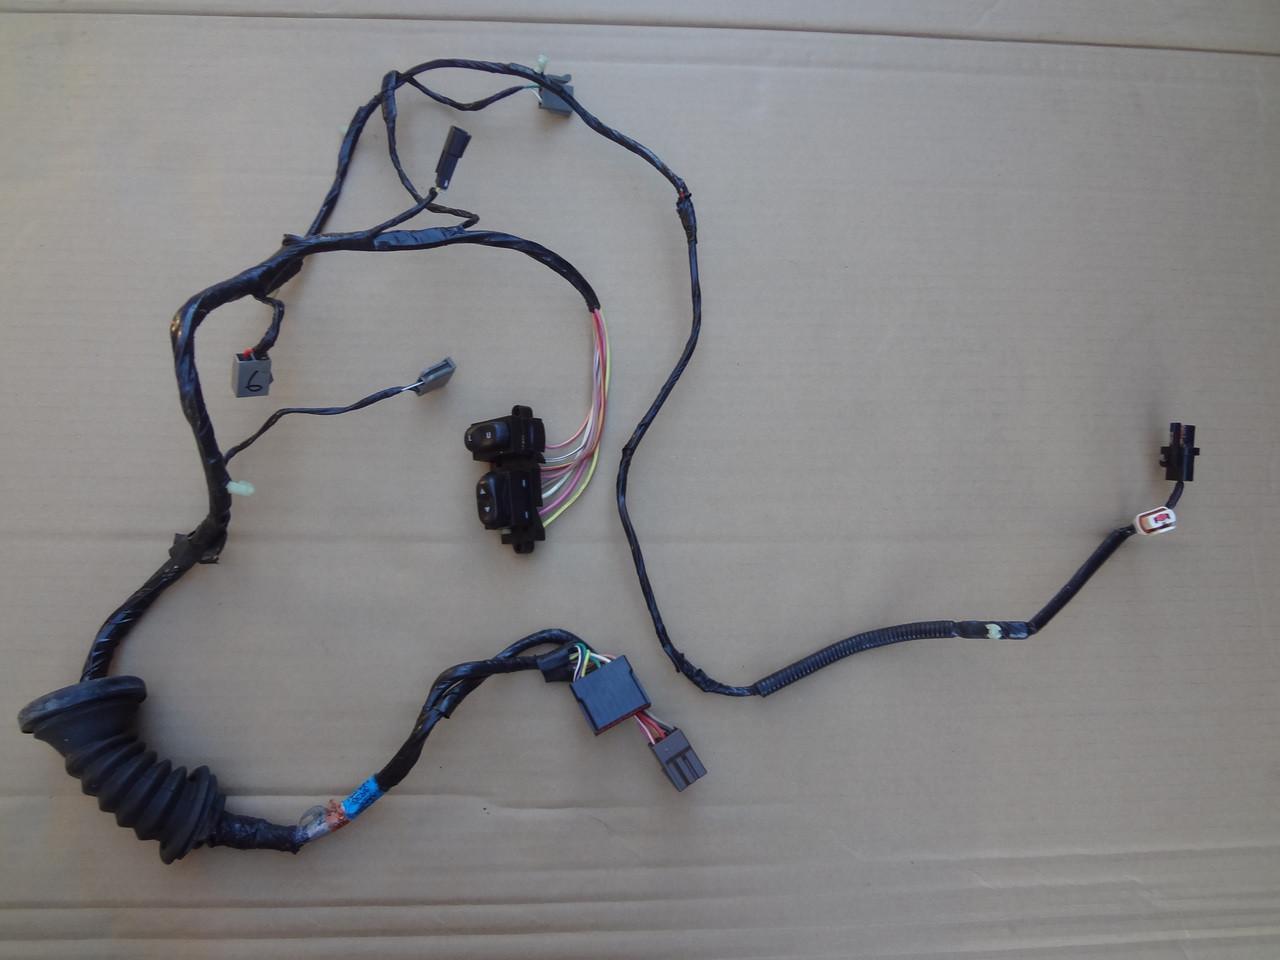 2003 2004 mustang cobra rh door wire harness switch 3r33 14a265 g2815 [ 1280 x 960 Pixel ]